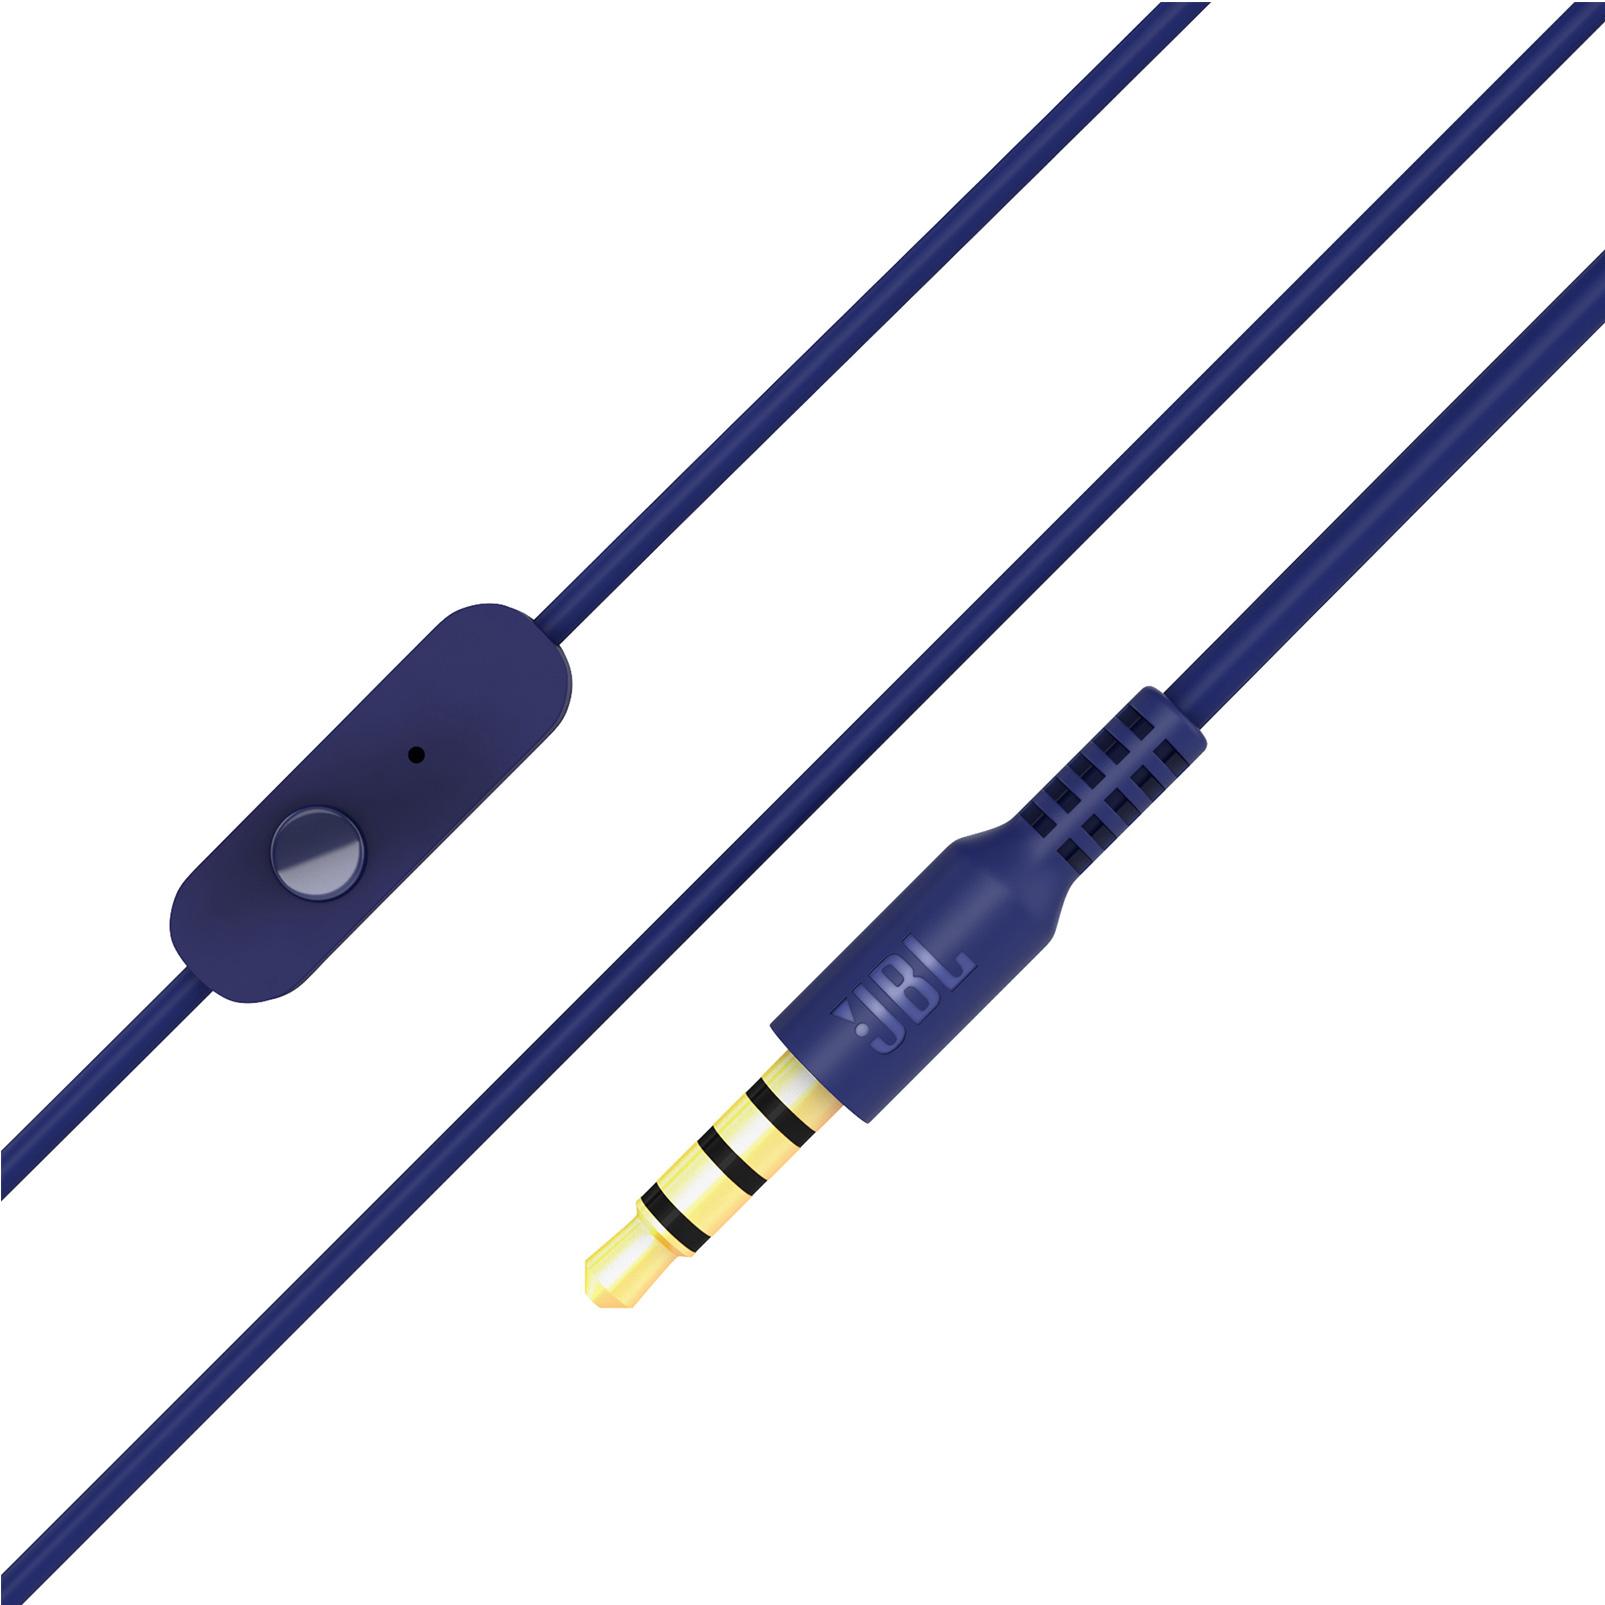 C200SI - Blue - In-Ear Headphones - Detailshot 3